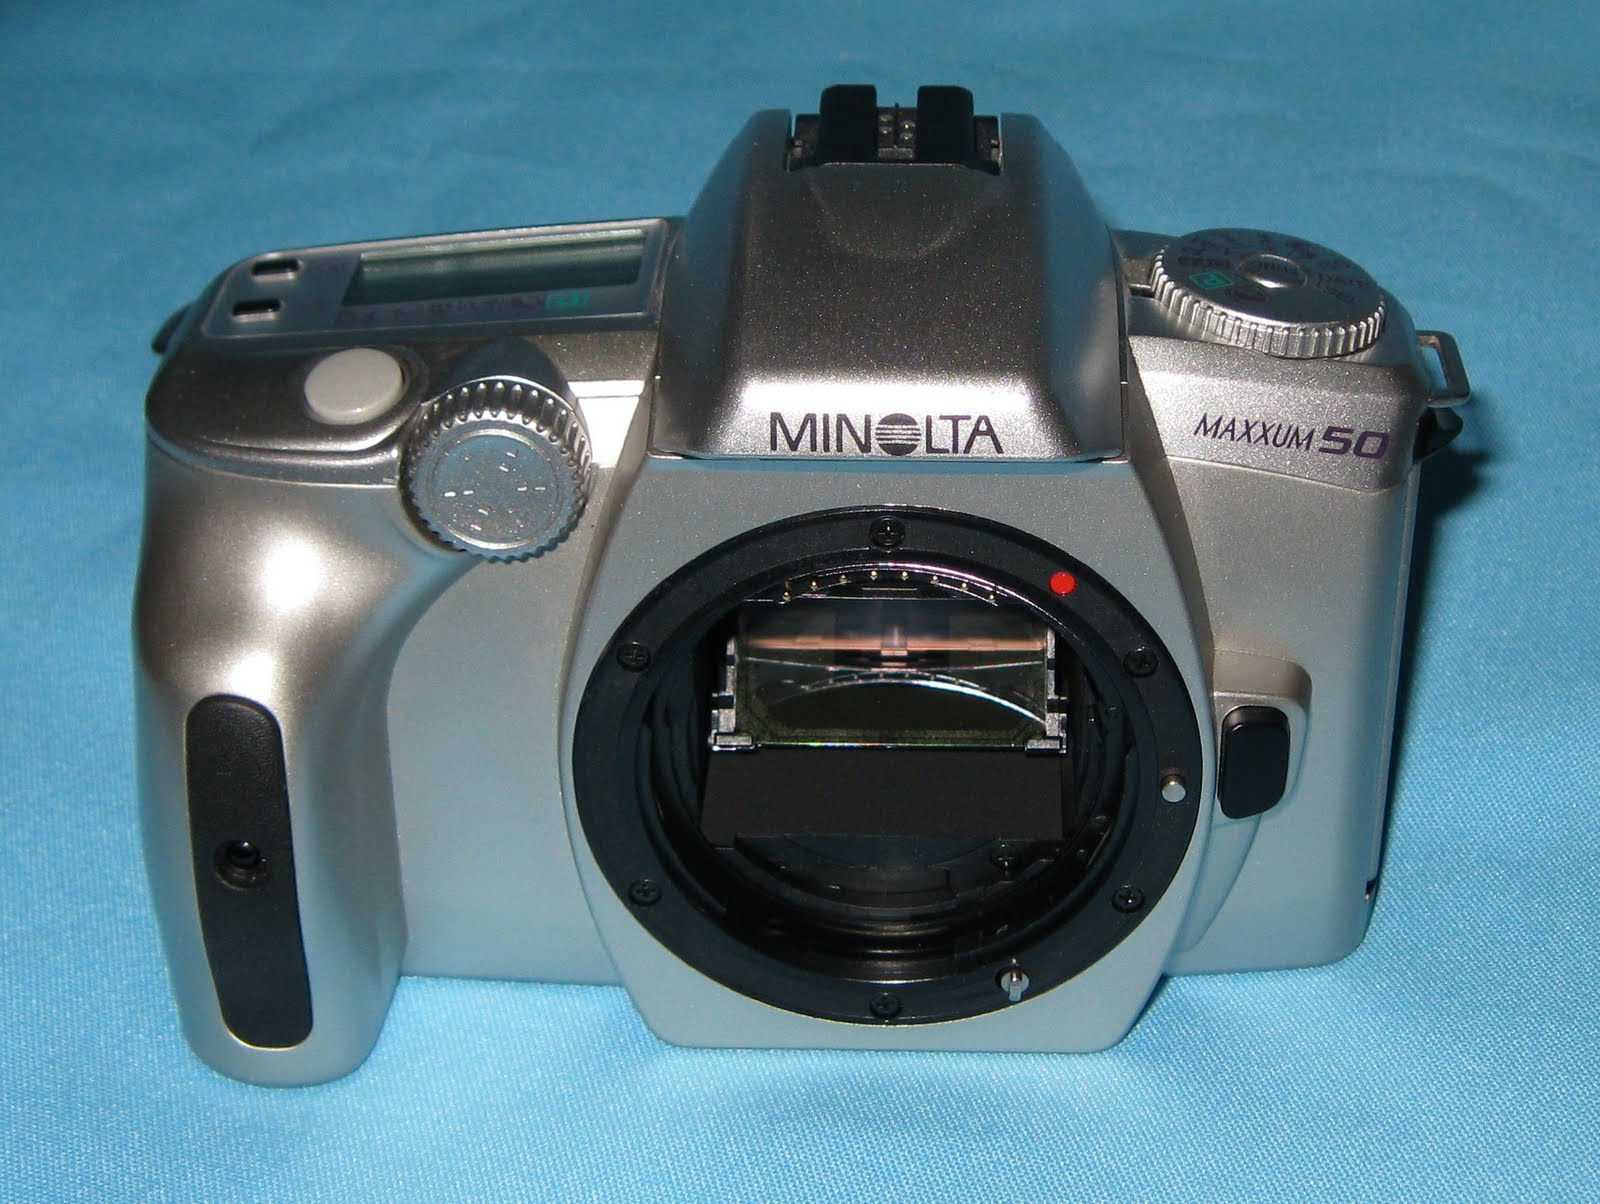 the chens the user s review minolta maxxum 50 slr film camera with rh mailch blogspot com Minolta Maxxum STSI Minolta Maxxum Htsi Plus